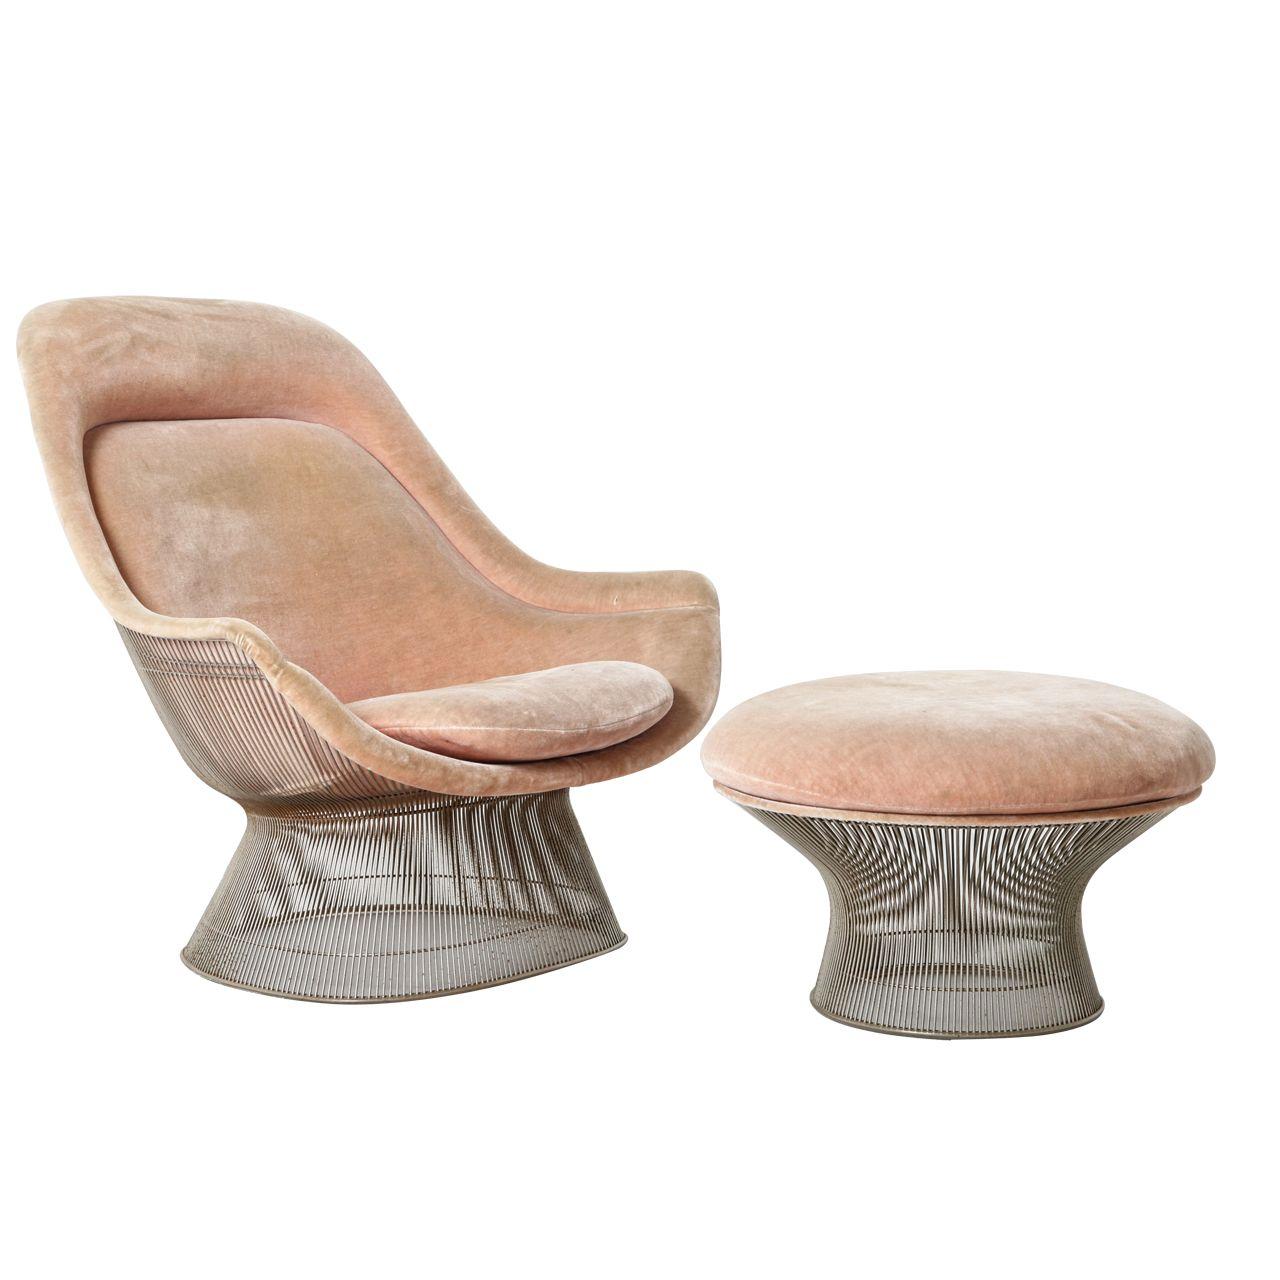 Warren Platner Lounge Chair & Ottoman | Sillas